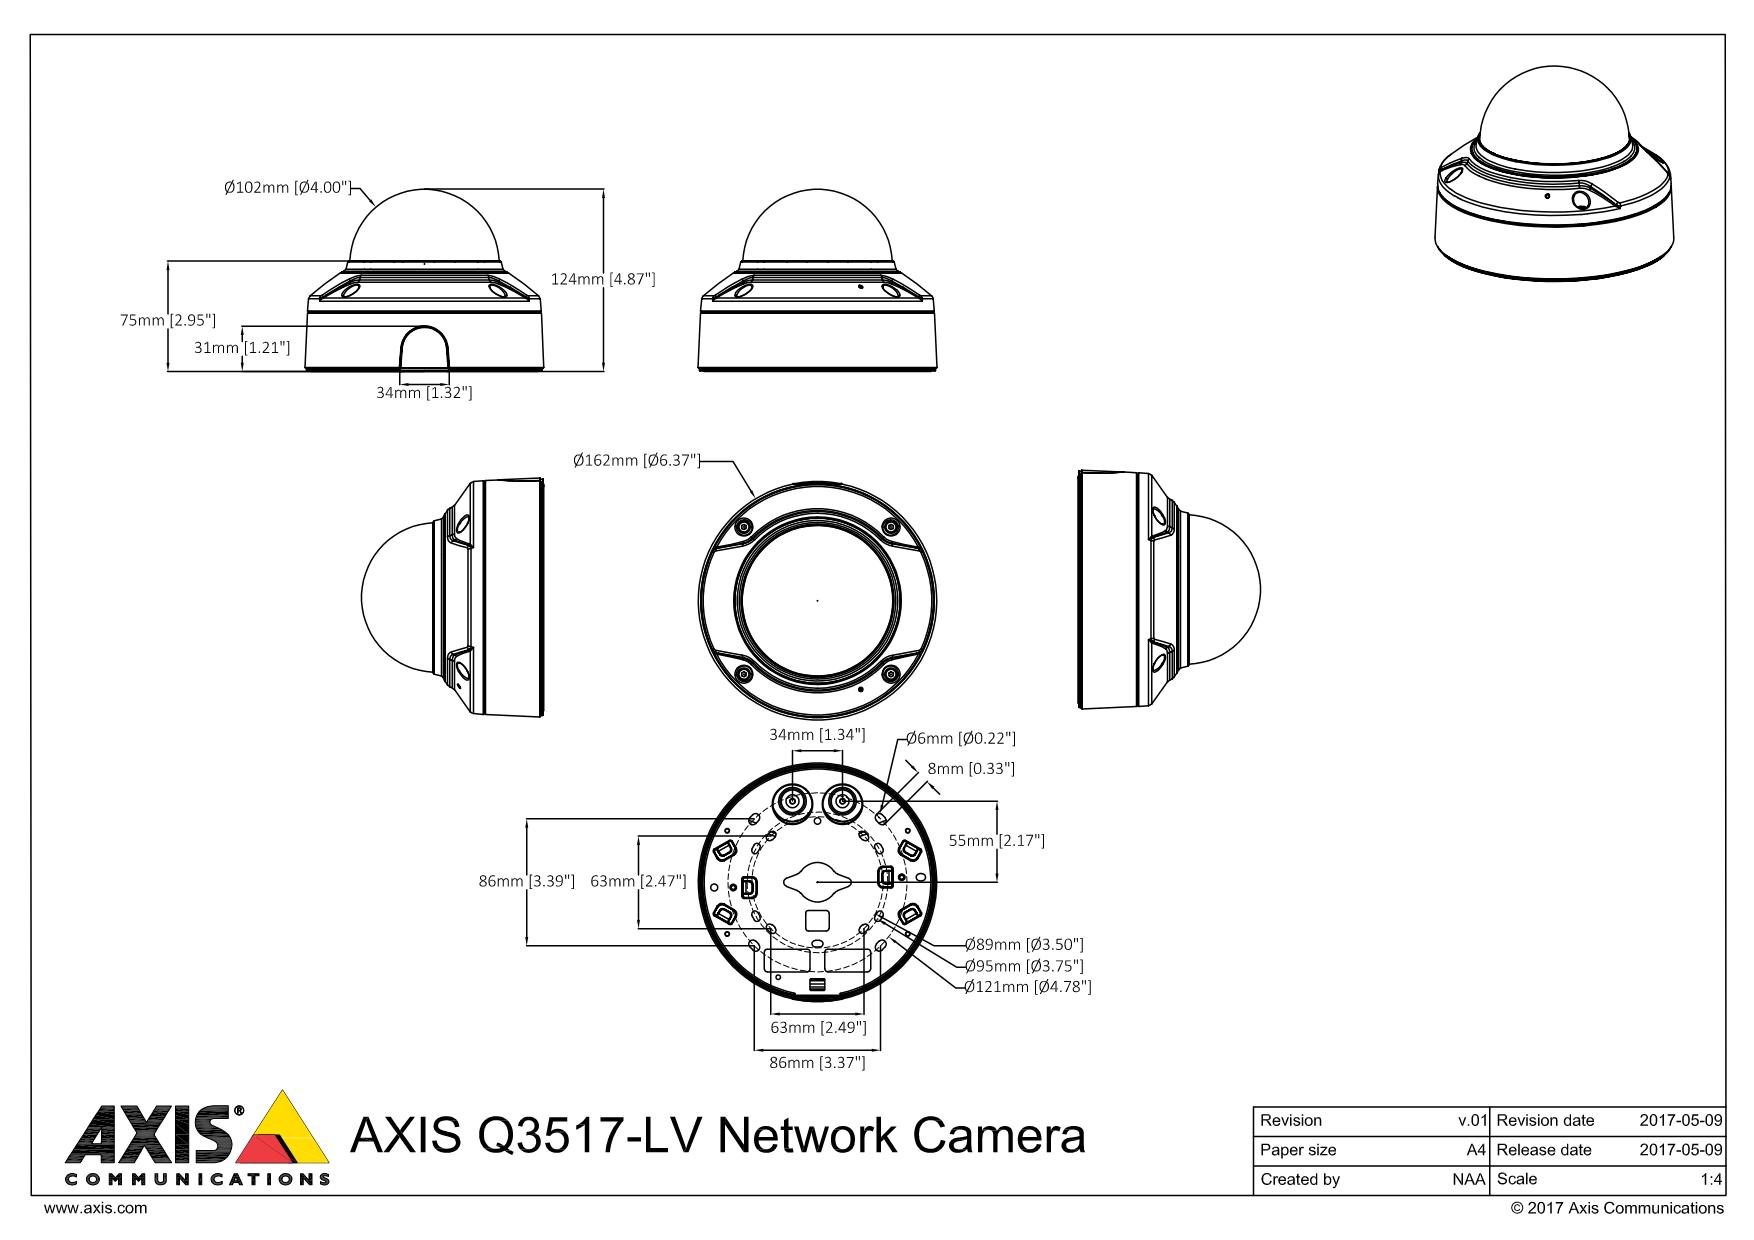 Q3517-LV